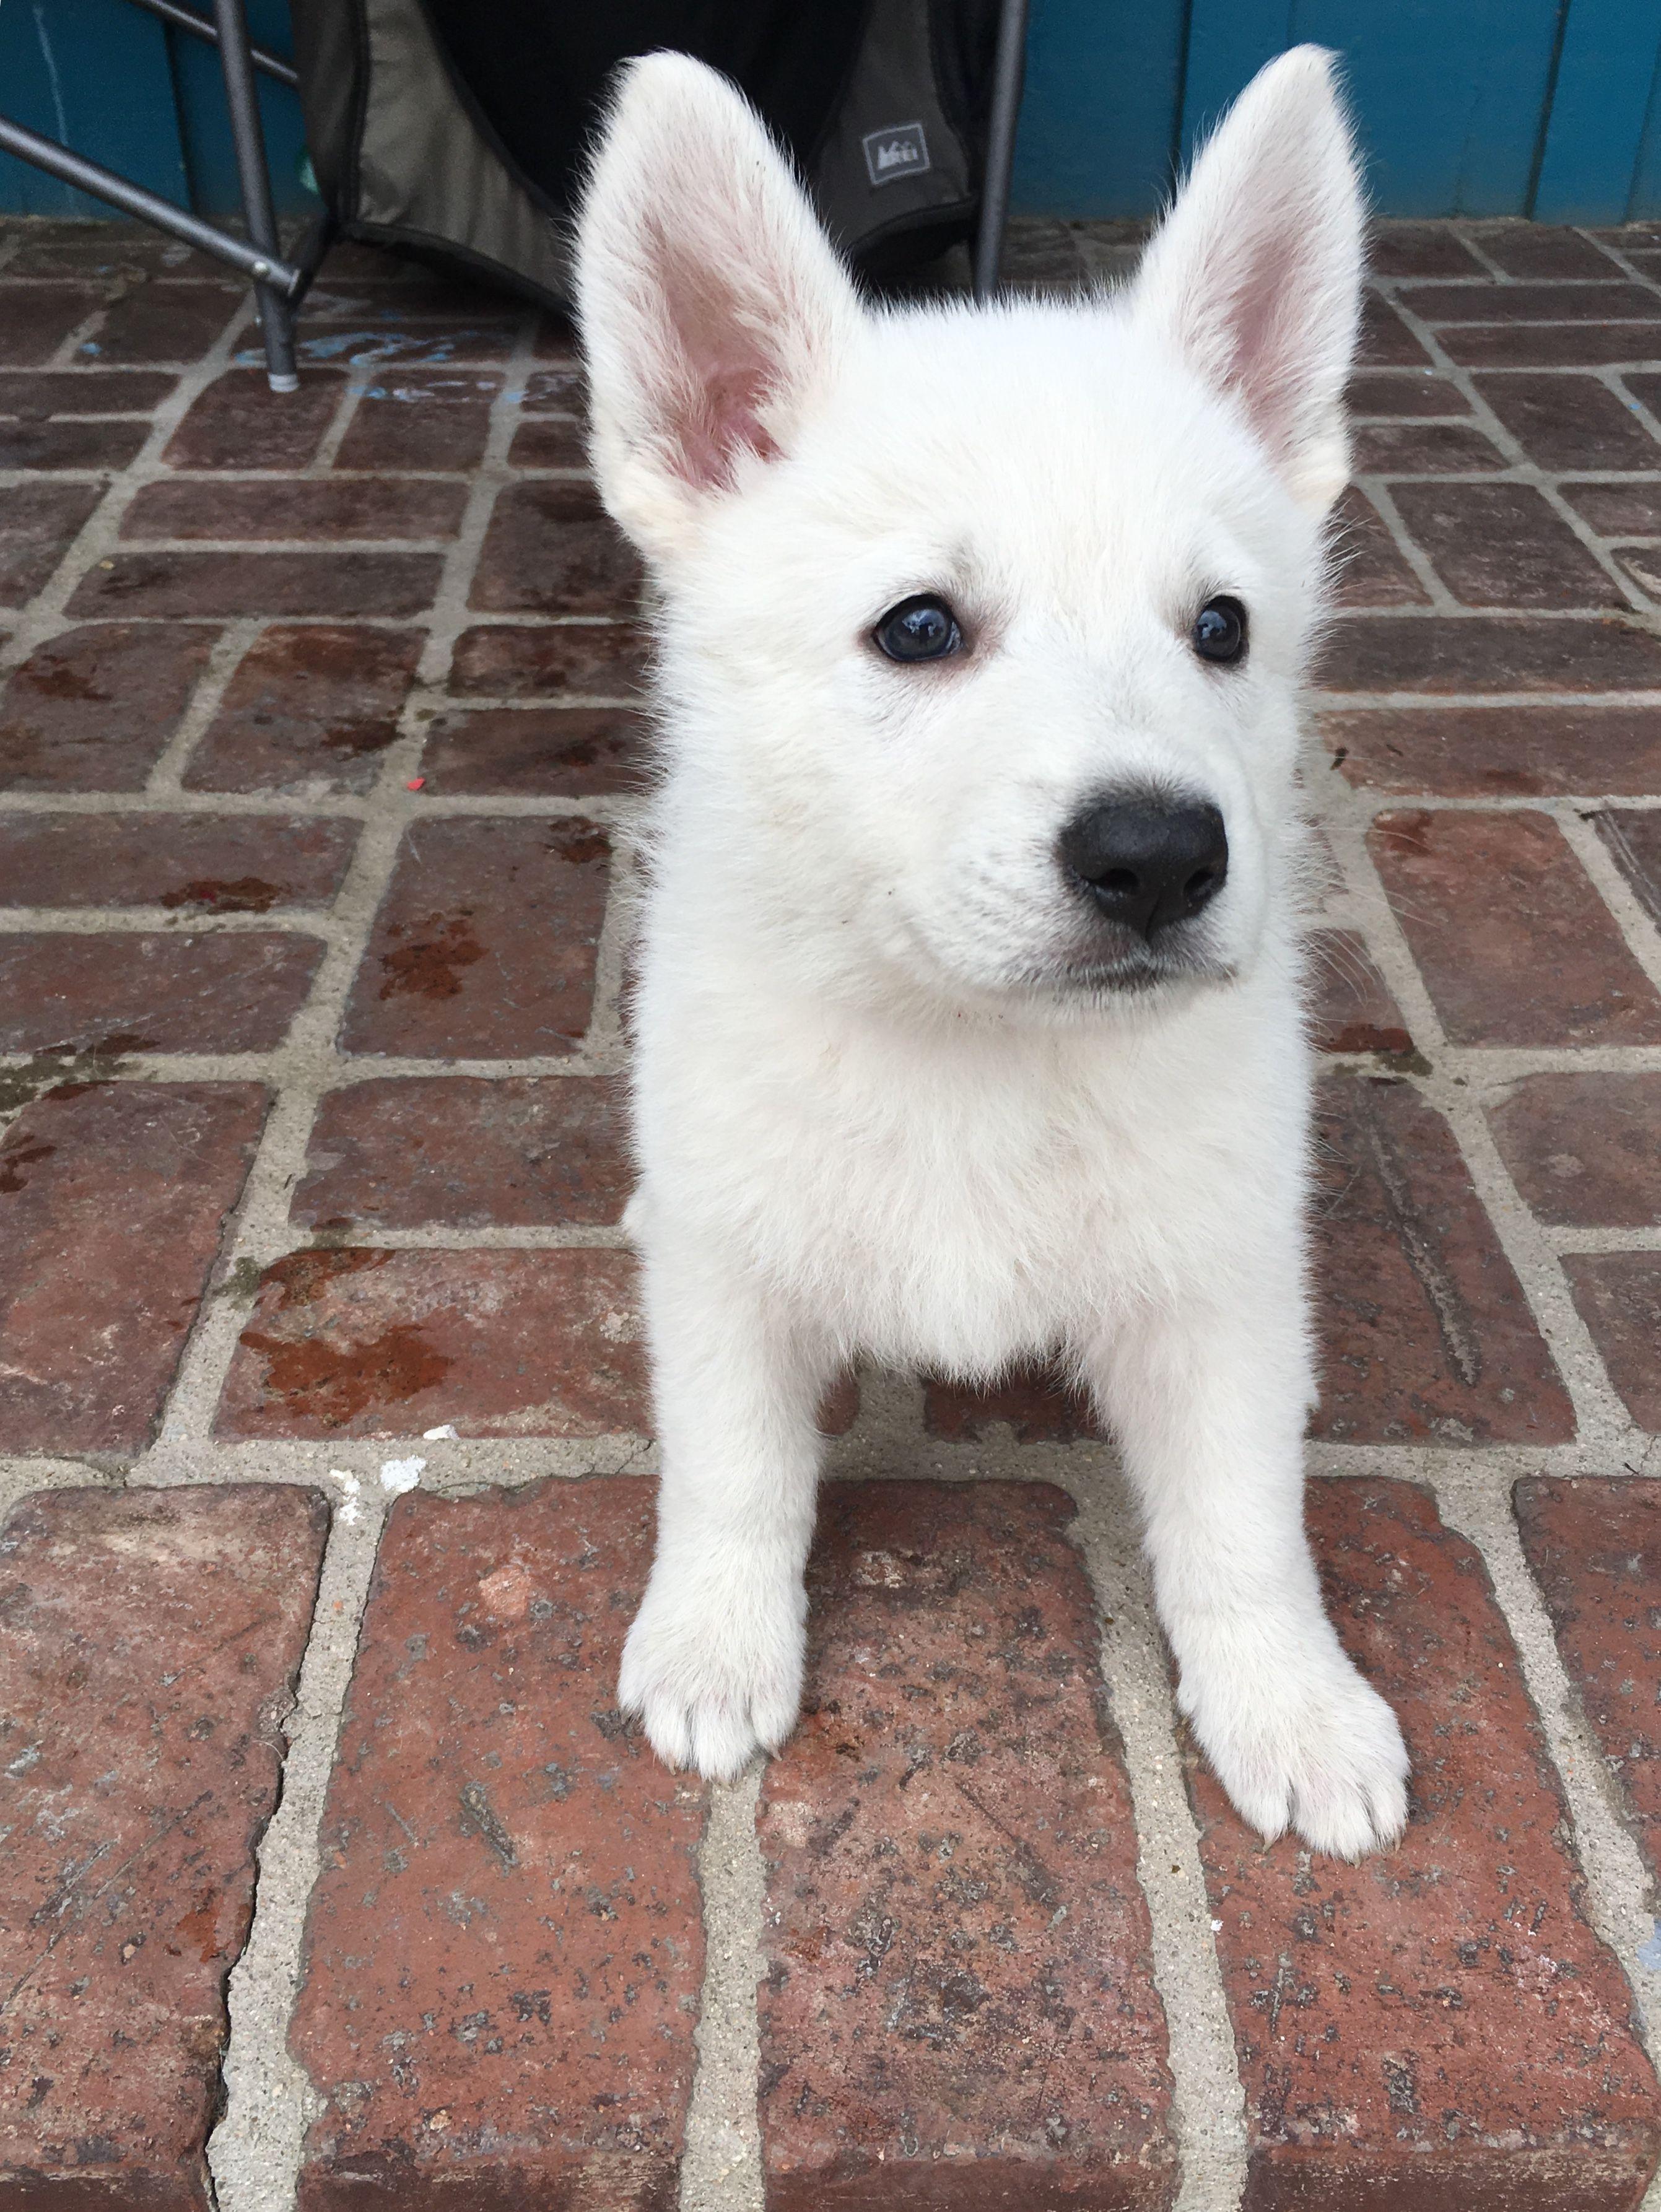 White Shepherd For Sale : white, shepherd, White, Shepherd, Puppy, Fullerton,, Puppies, Responsible, Br…, Puppies,